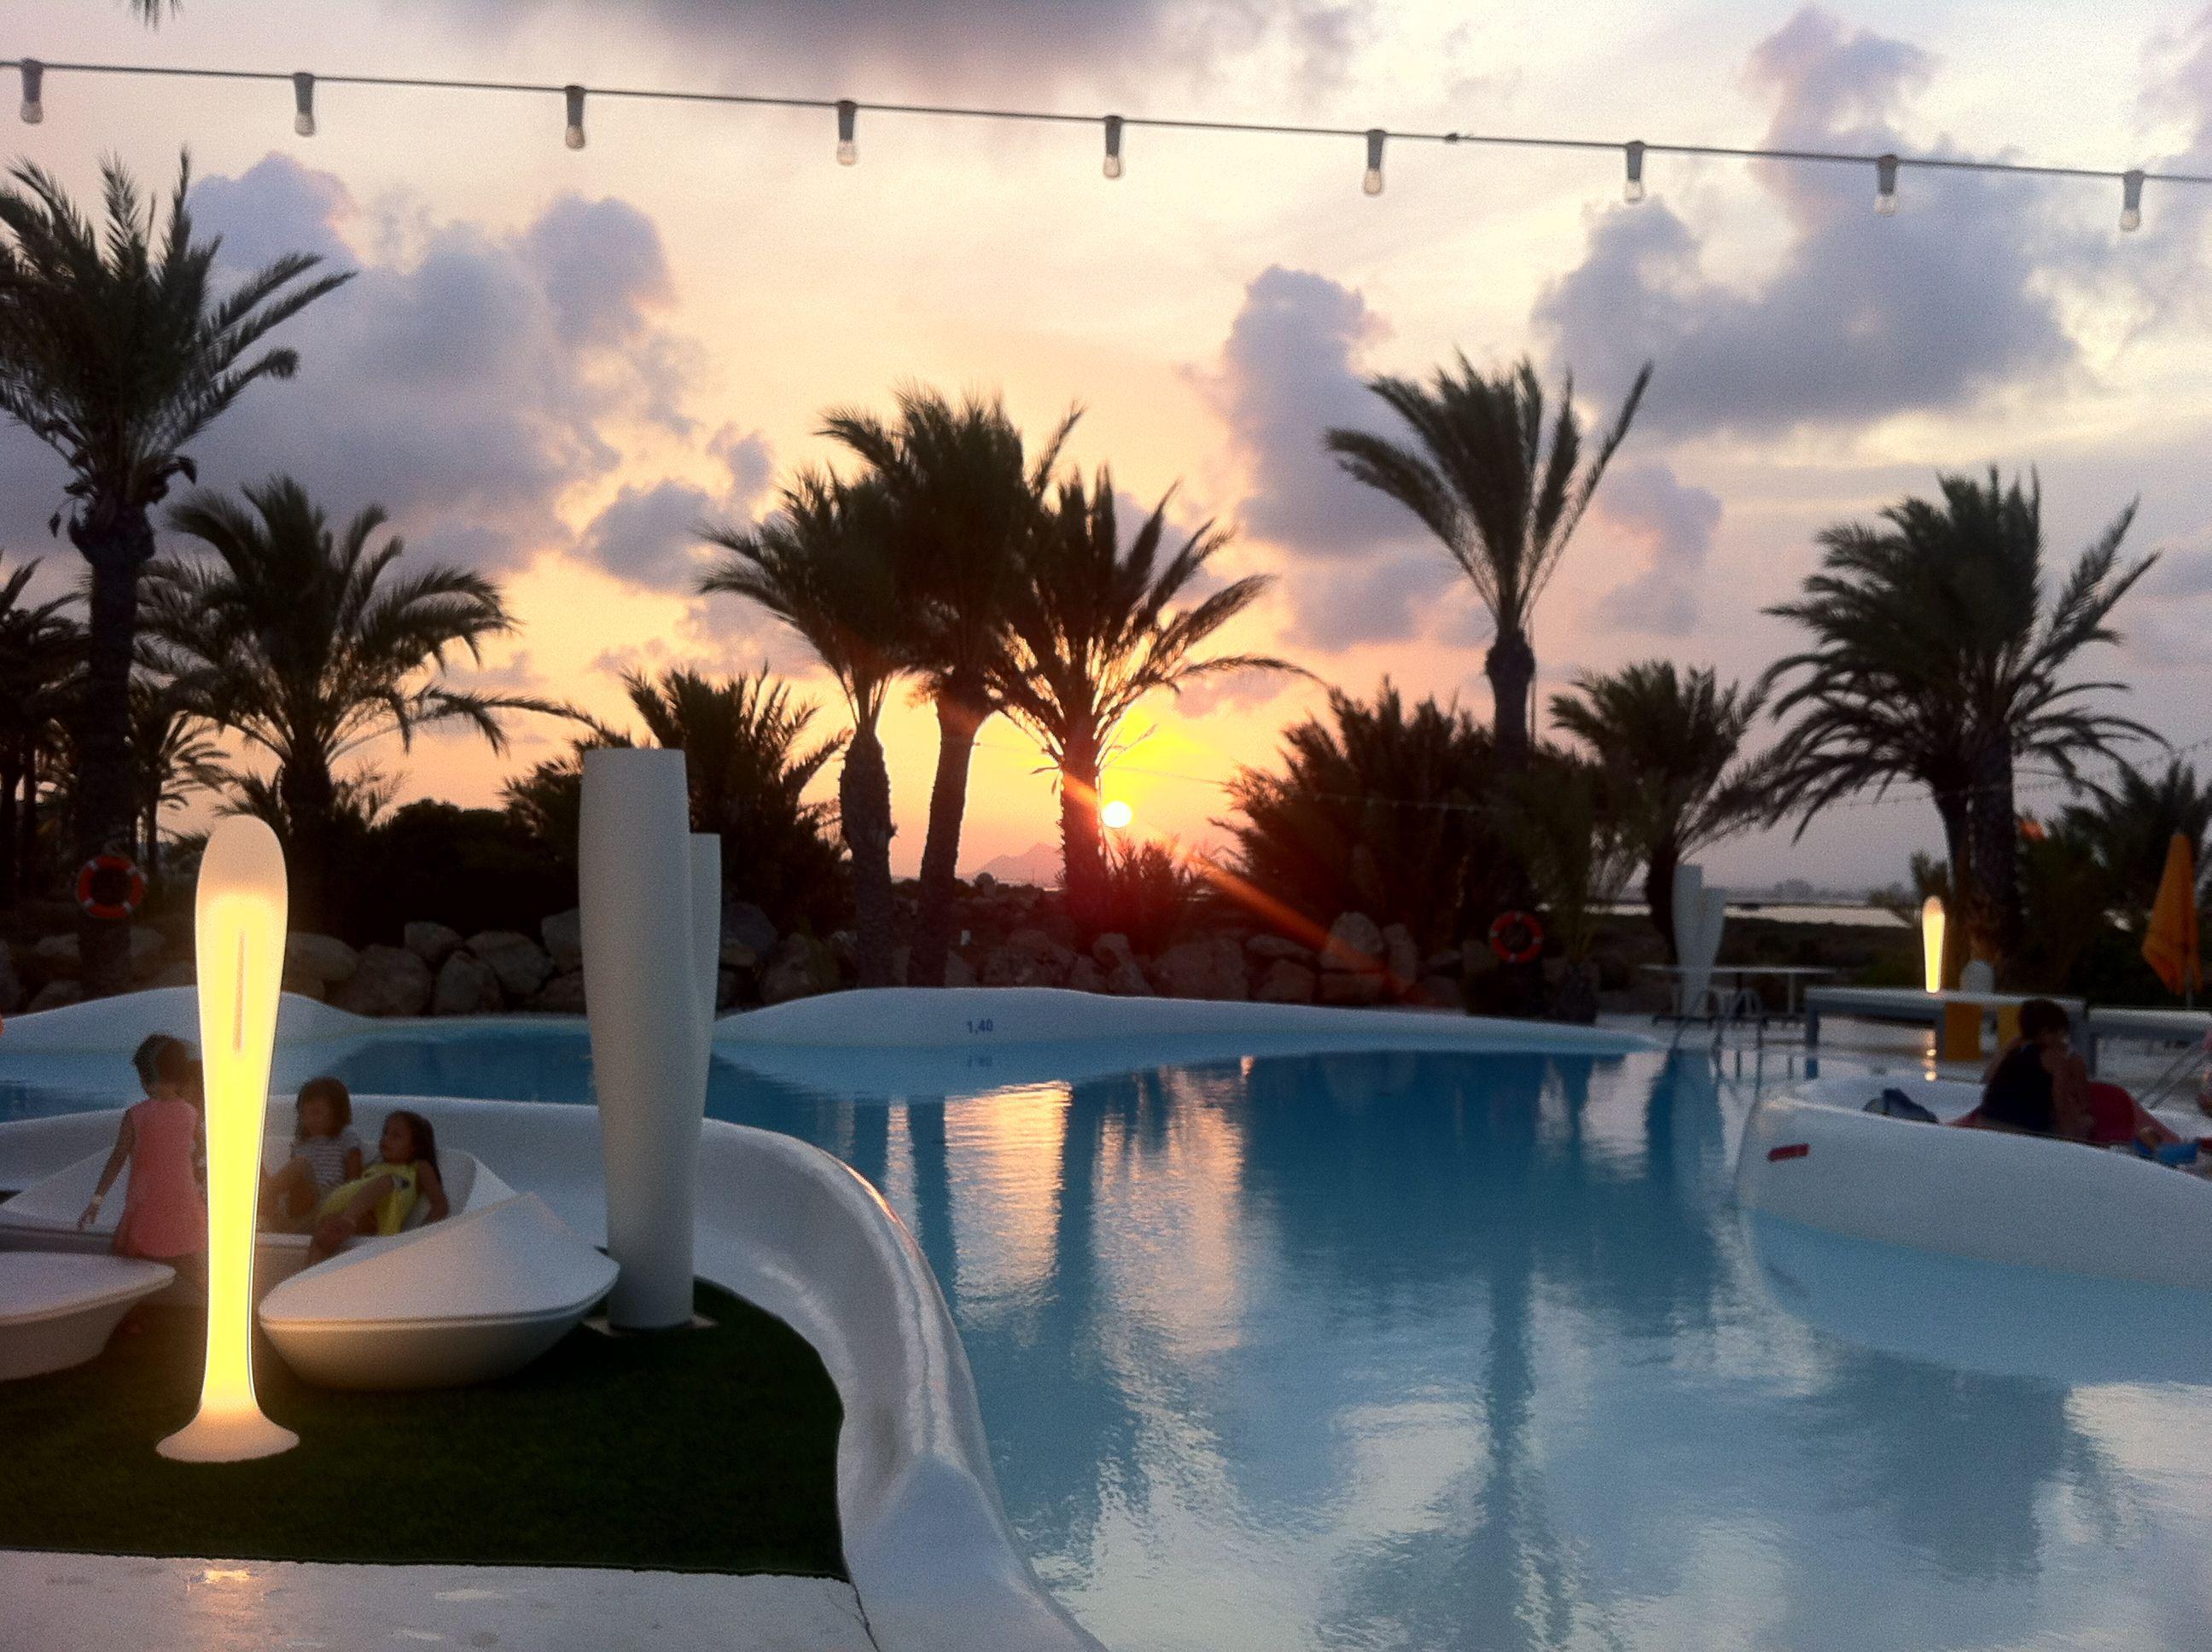 Summer.Murcia. Spain